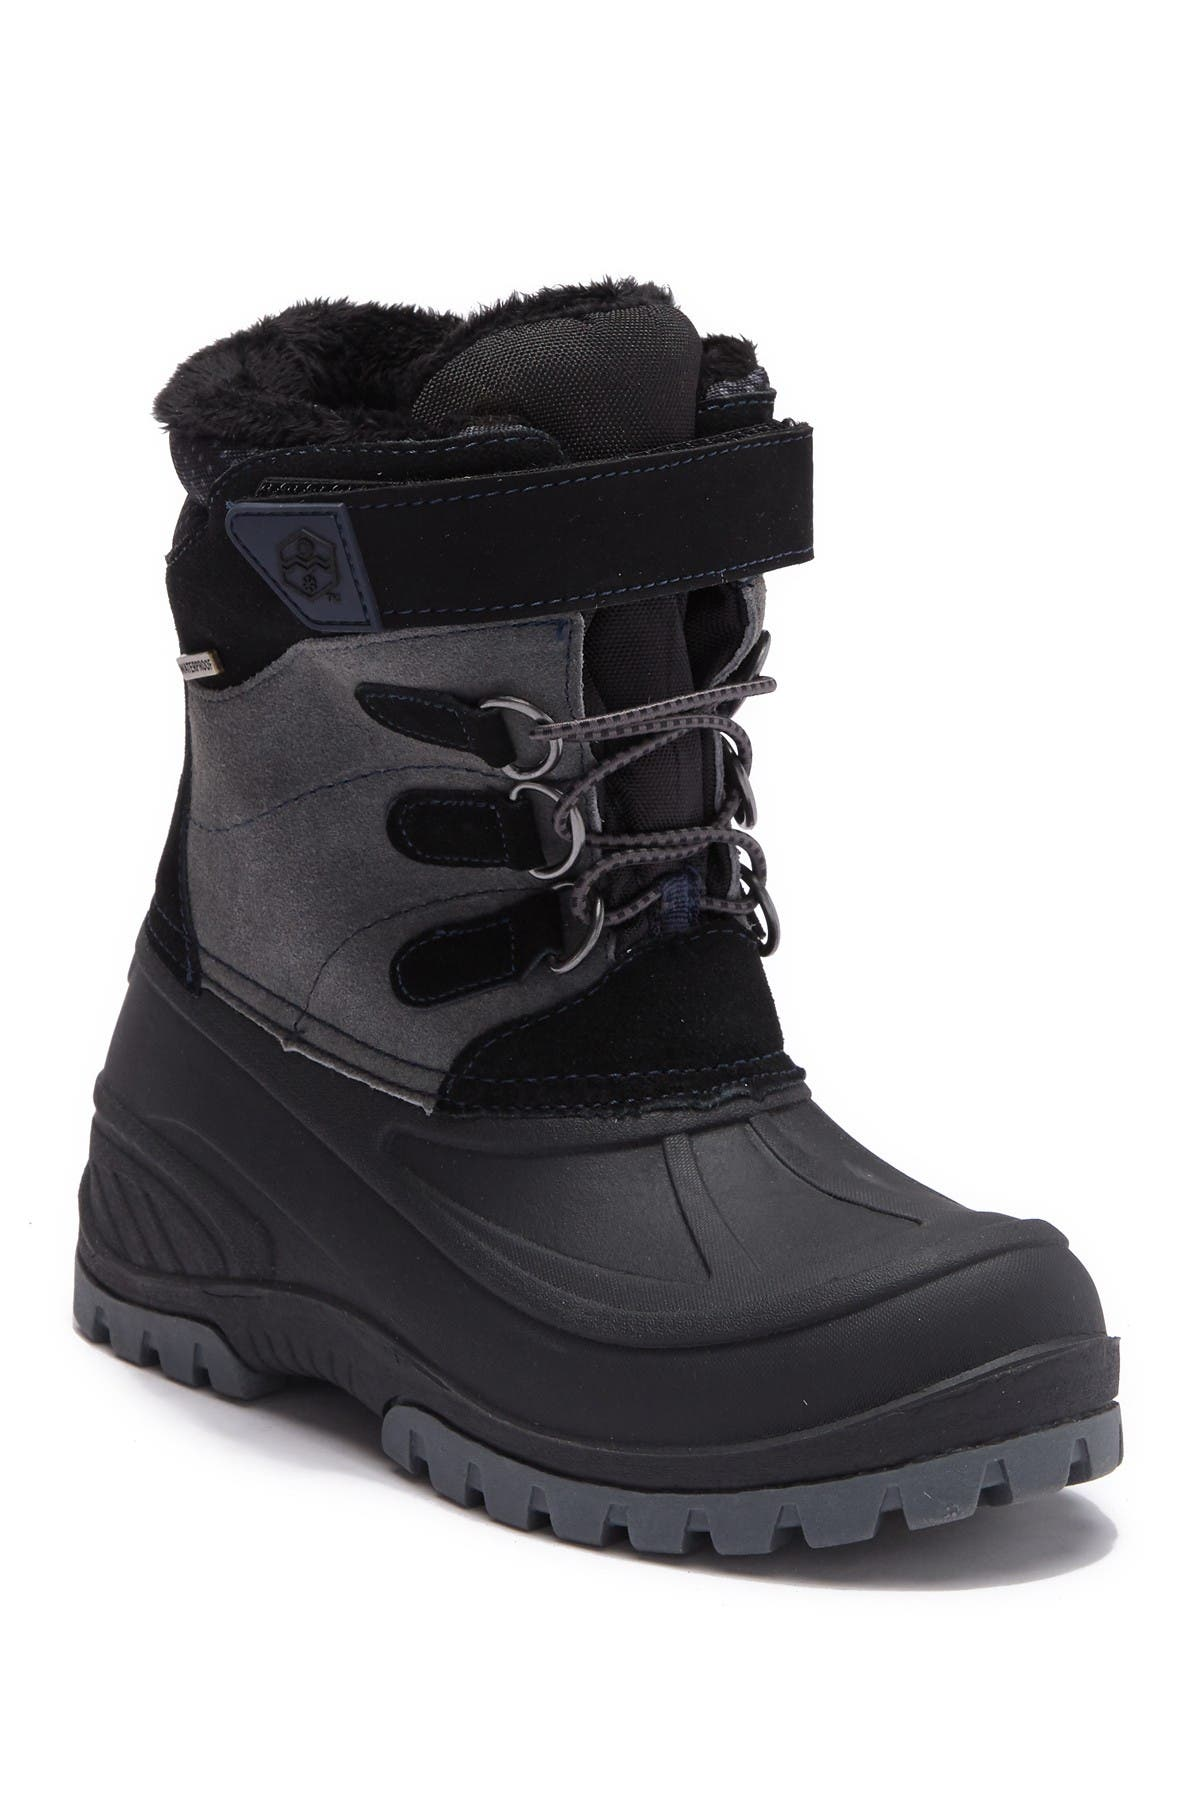 Image of Khombu Snowtracker Faux Fur Lined Waterproof Boot